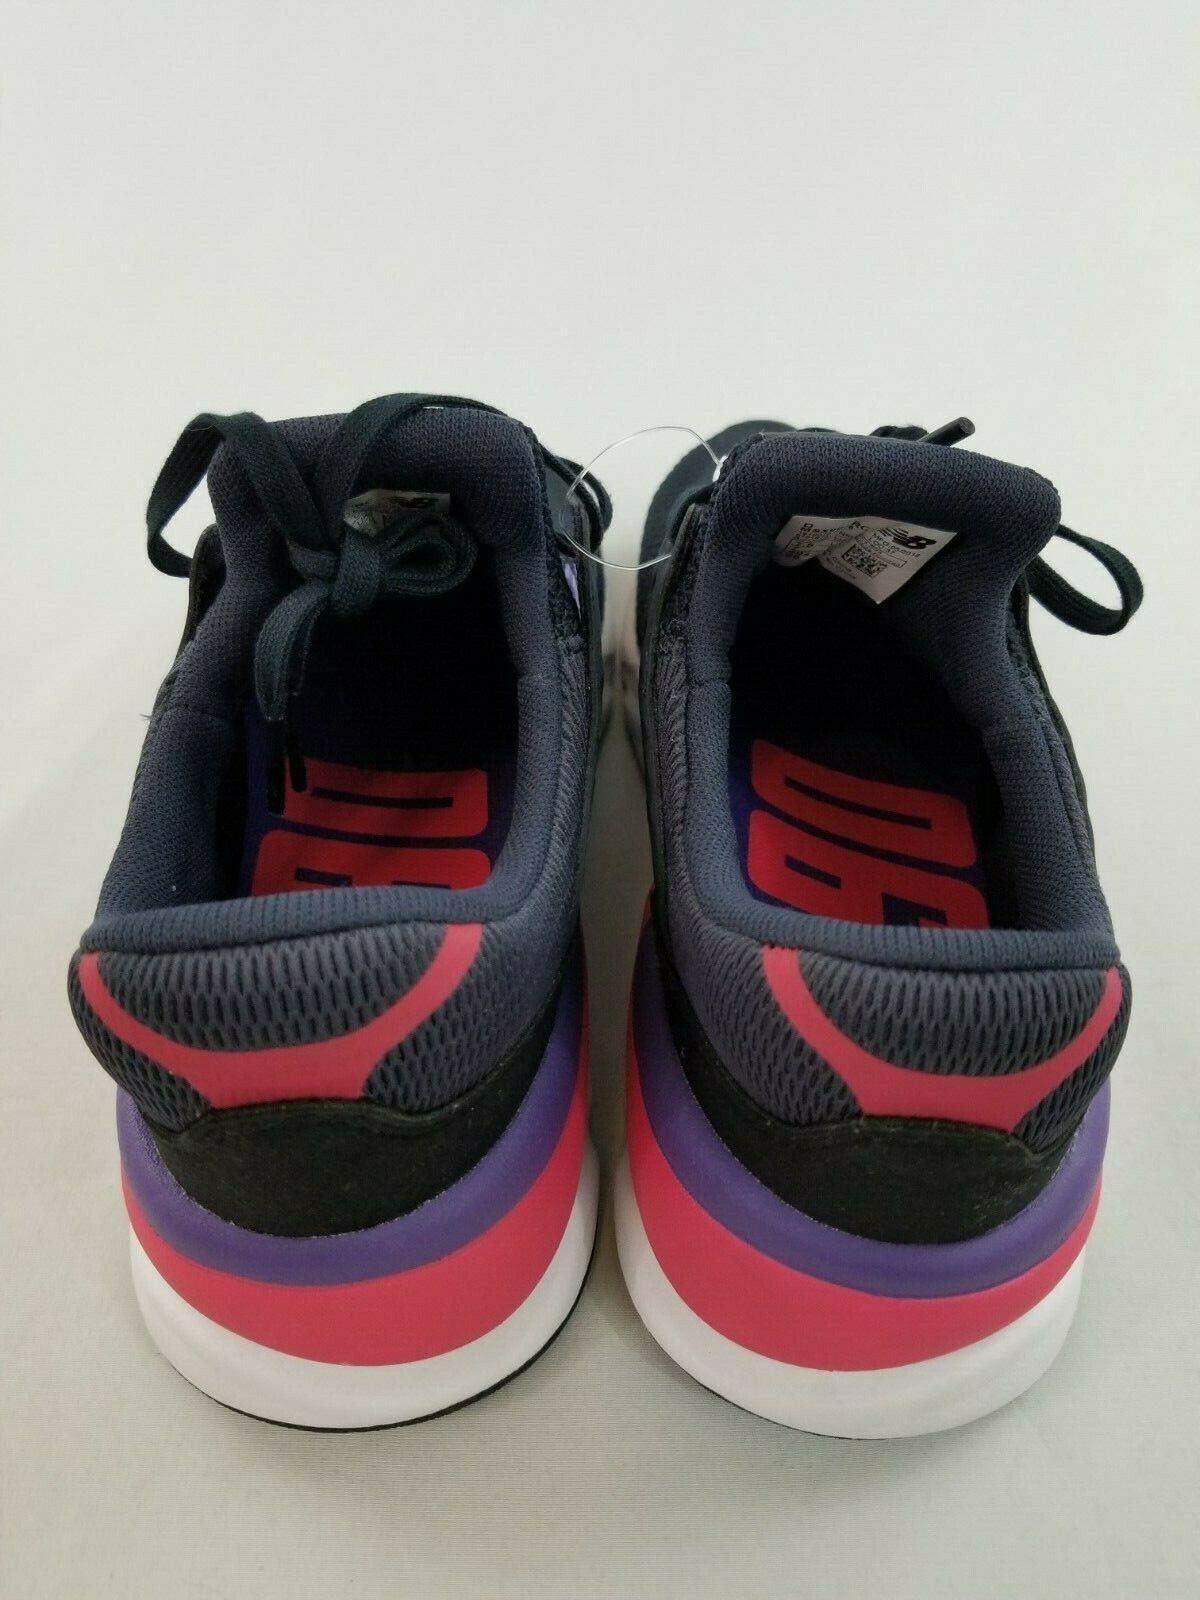 Neu New Balance Herren Schuhe Sneakers X-90 Laufen MSX90CRC Grau 7.5 D Msrp image 5